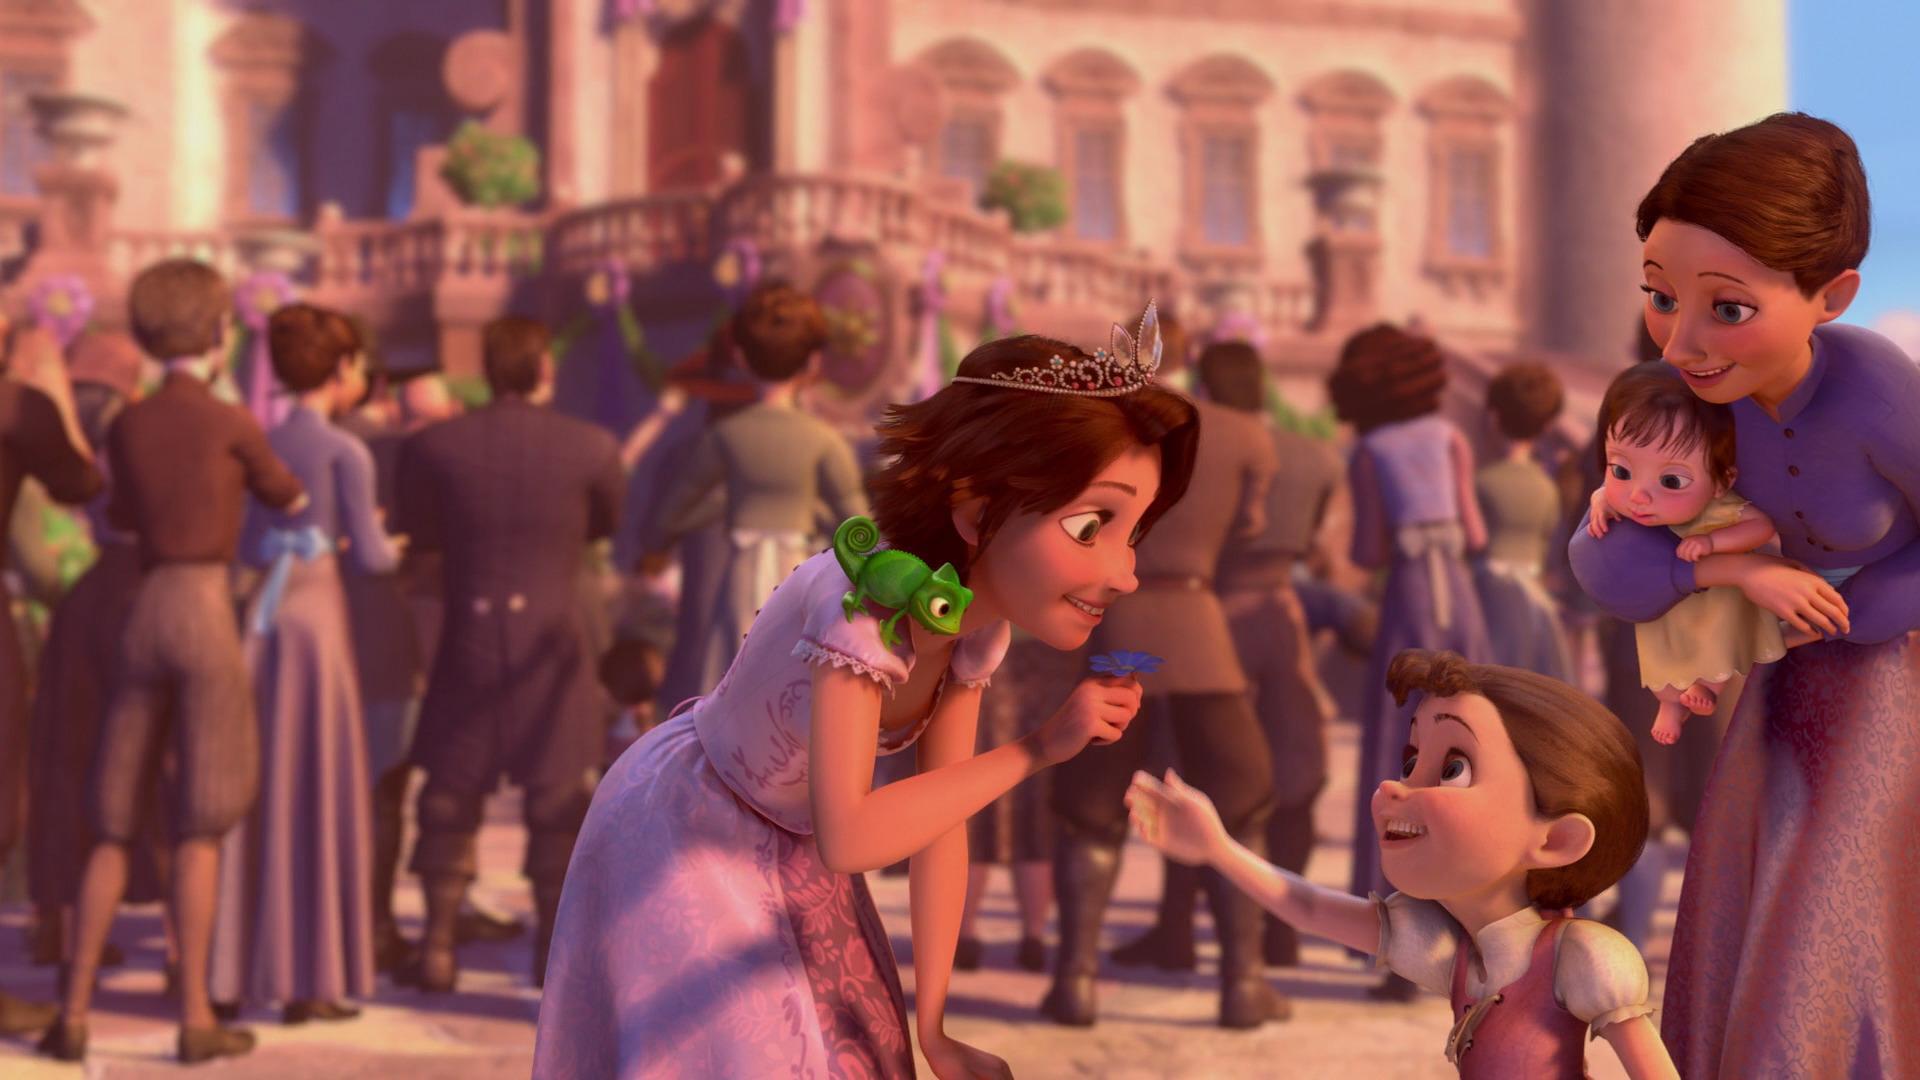 Princess Rapunzel Ending Rapunzel Of Disney S Tangled Photo 35423068 Fanpop